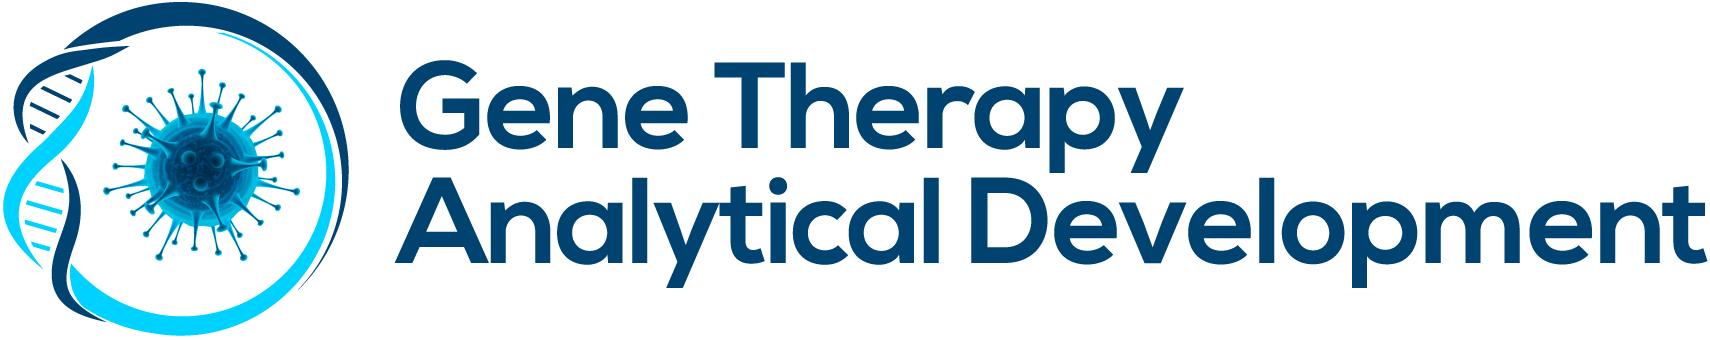 4384_Gene_Therapy_Analytical_Development_Logo